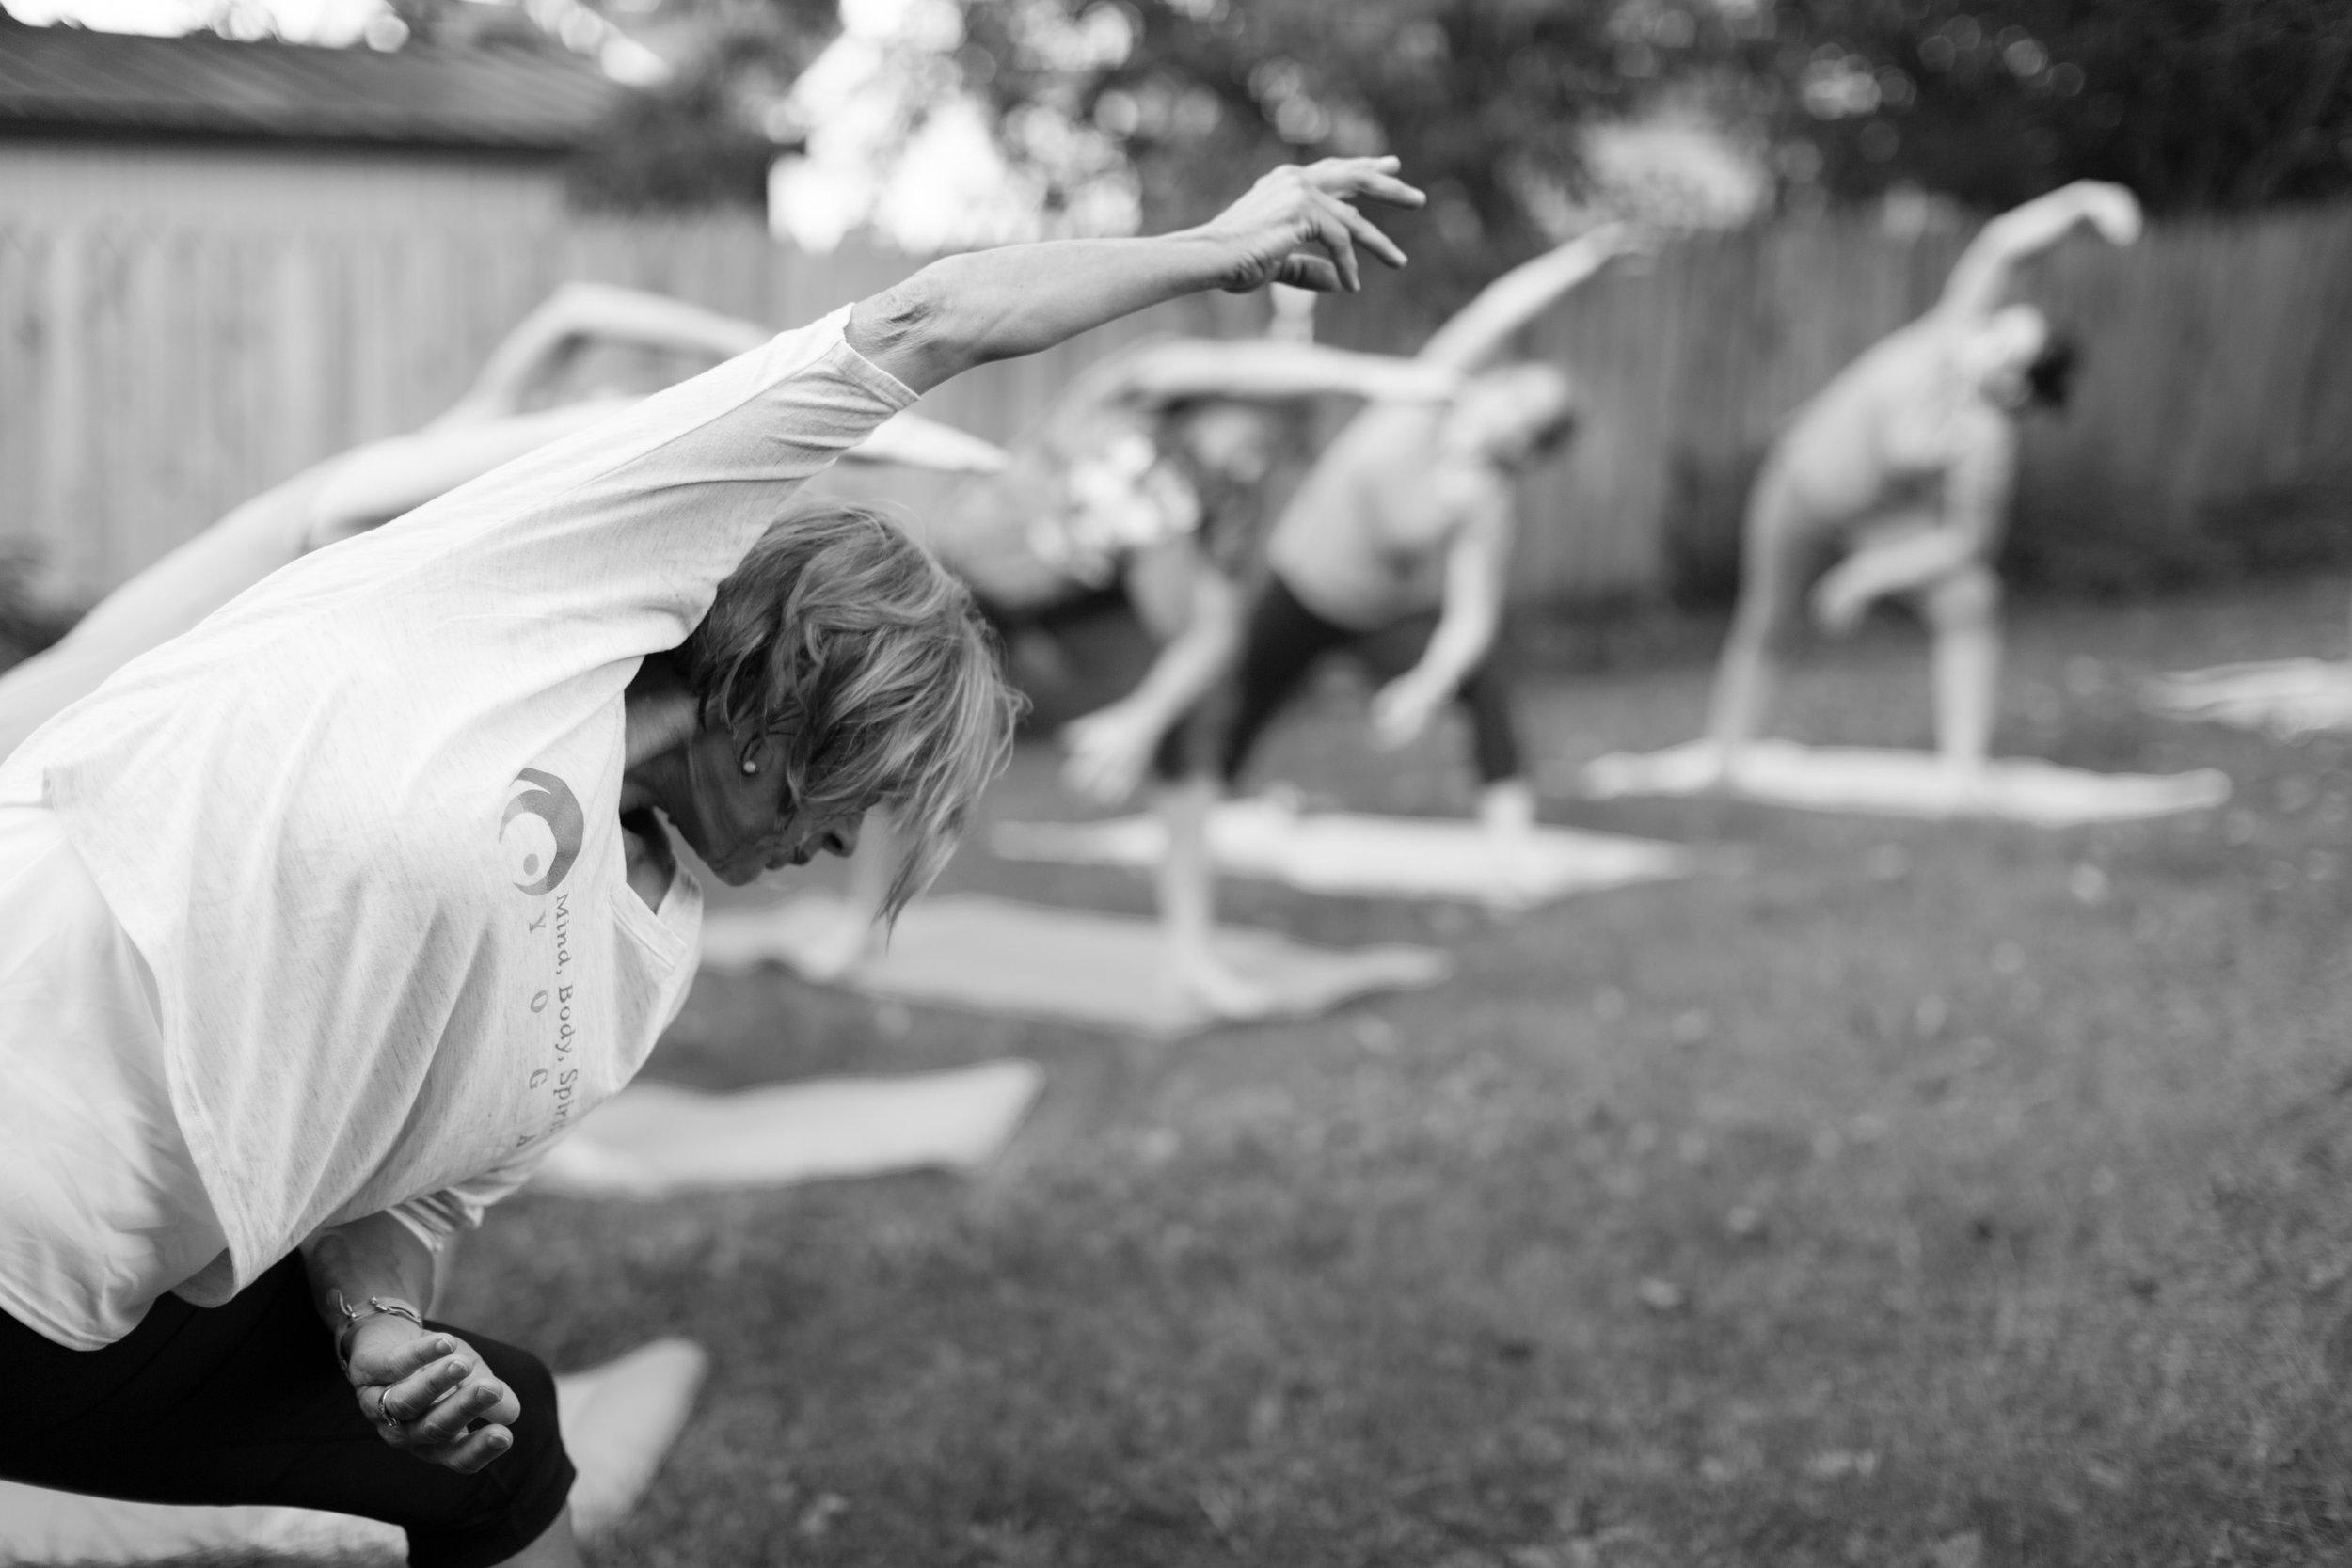 005-Outdoor-Yard-Yoga-Classes-Medford-Wisconsin.jpg